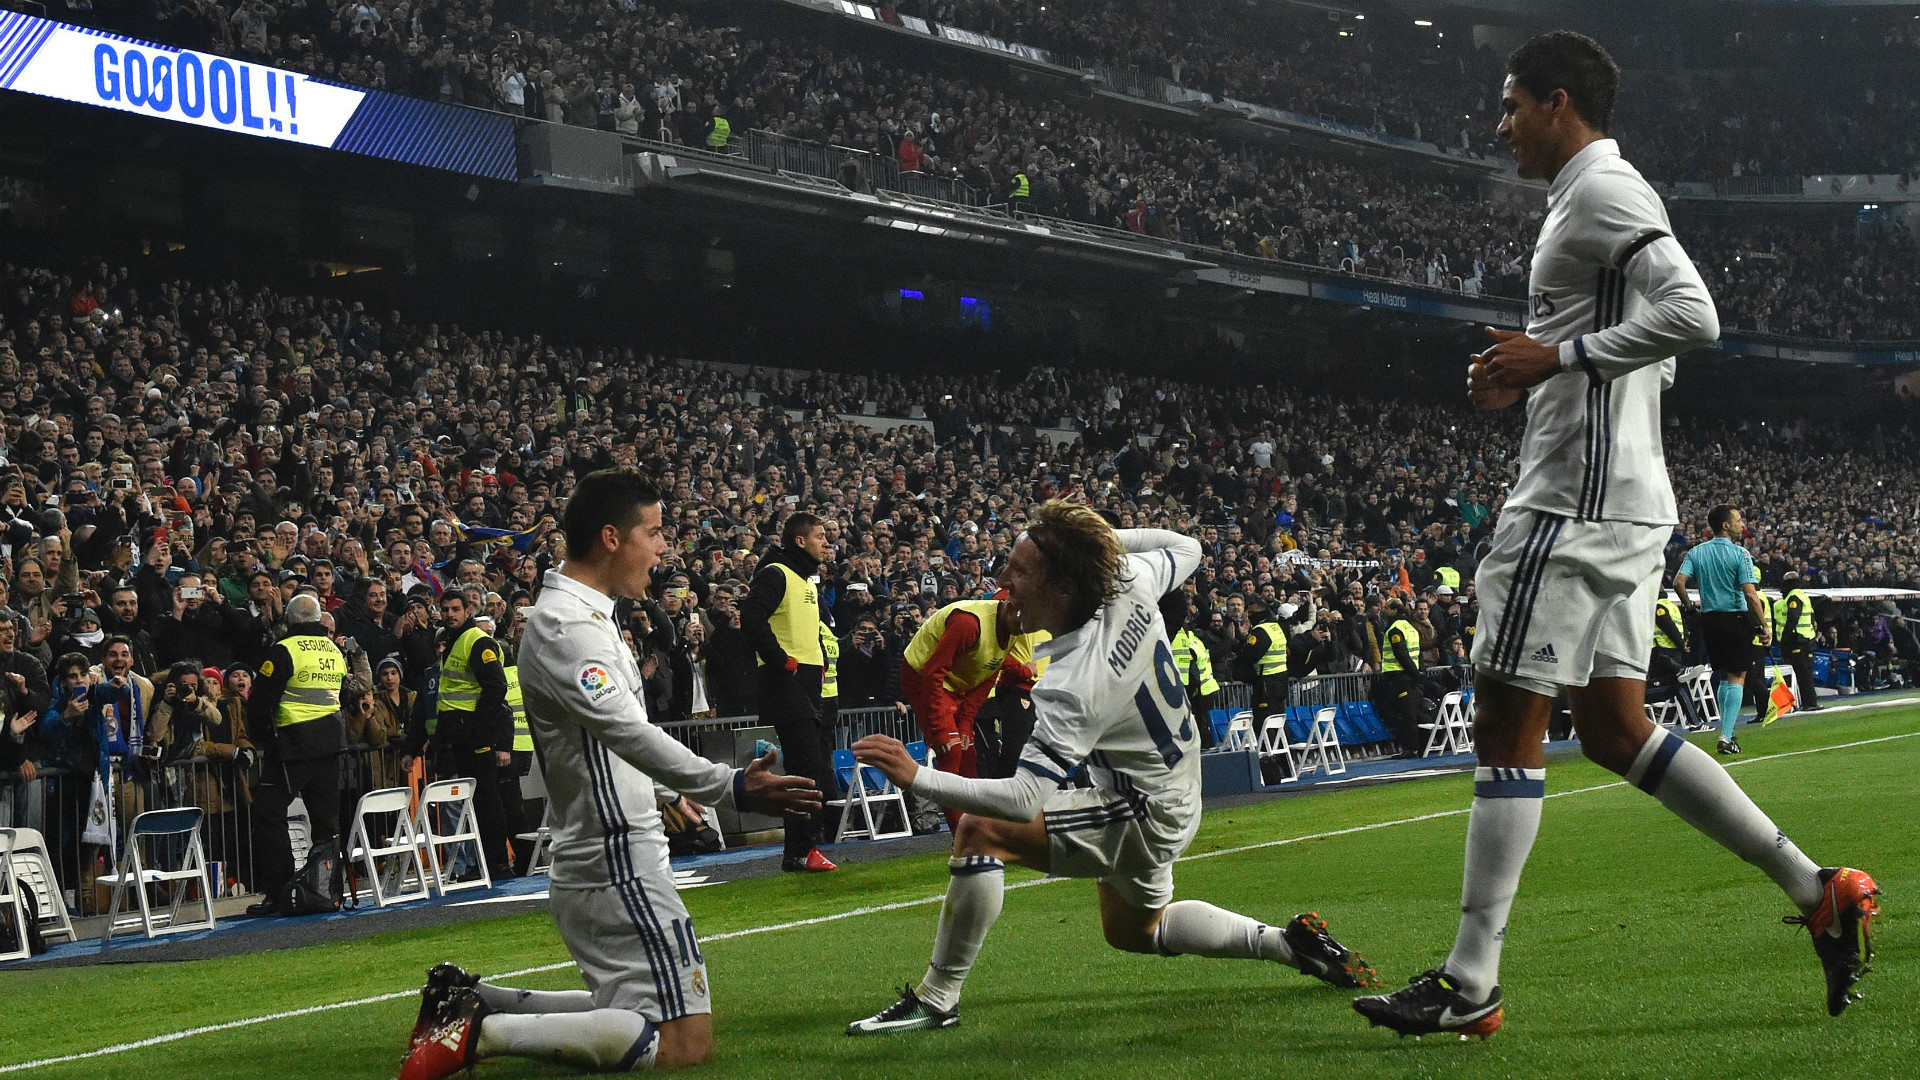 Real Madrid Wallpaper Latest Photos #54kzt181